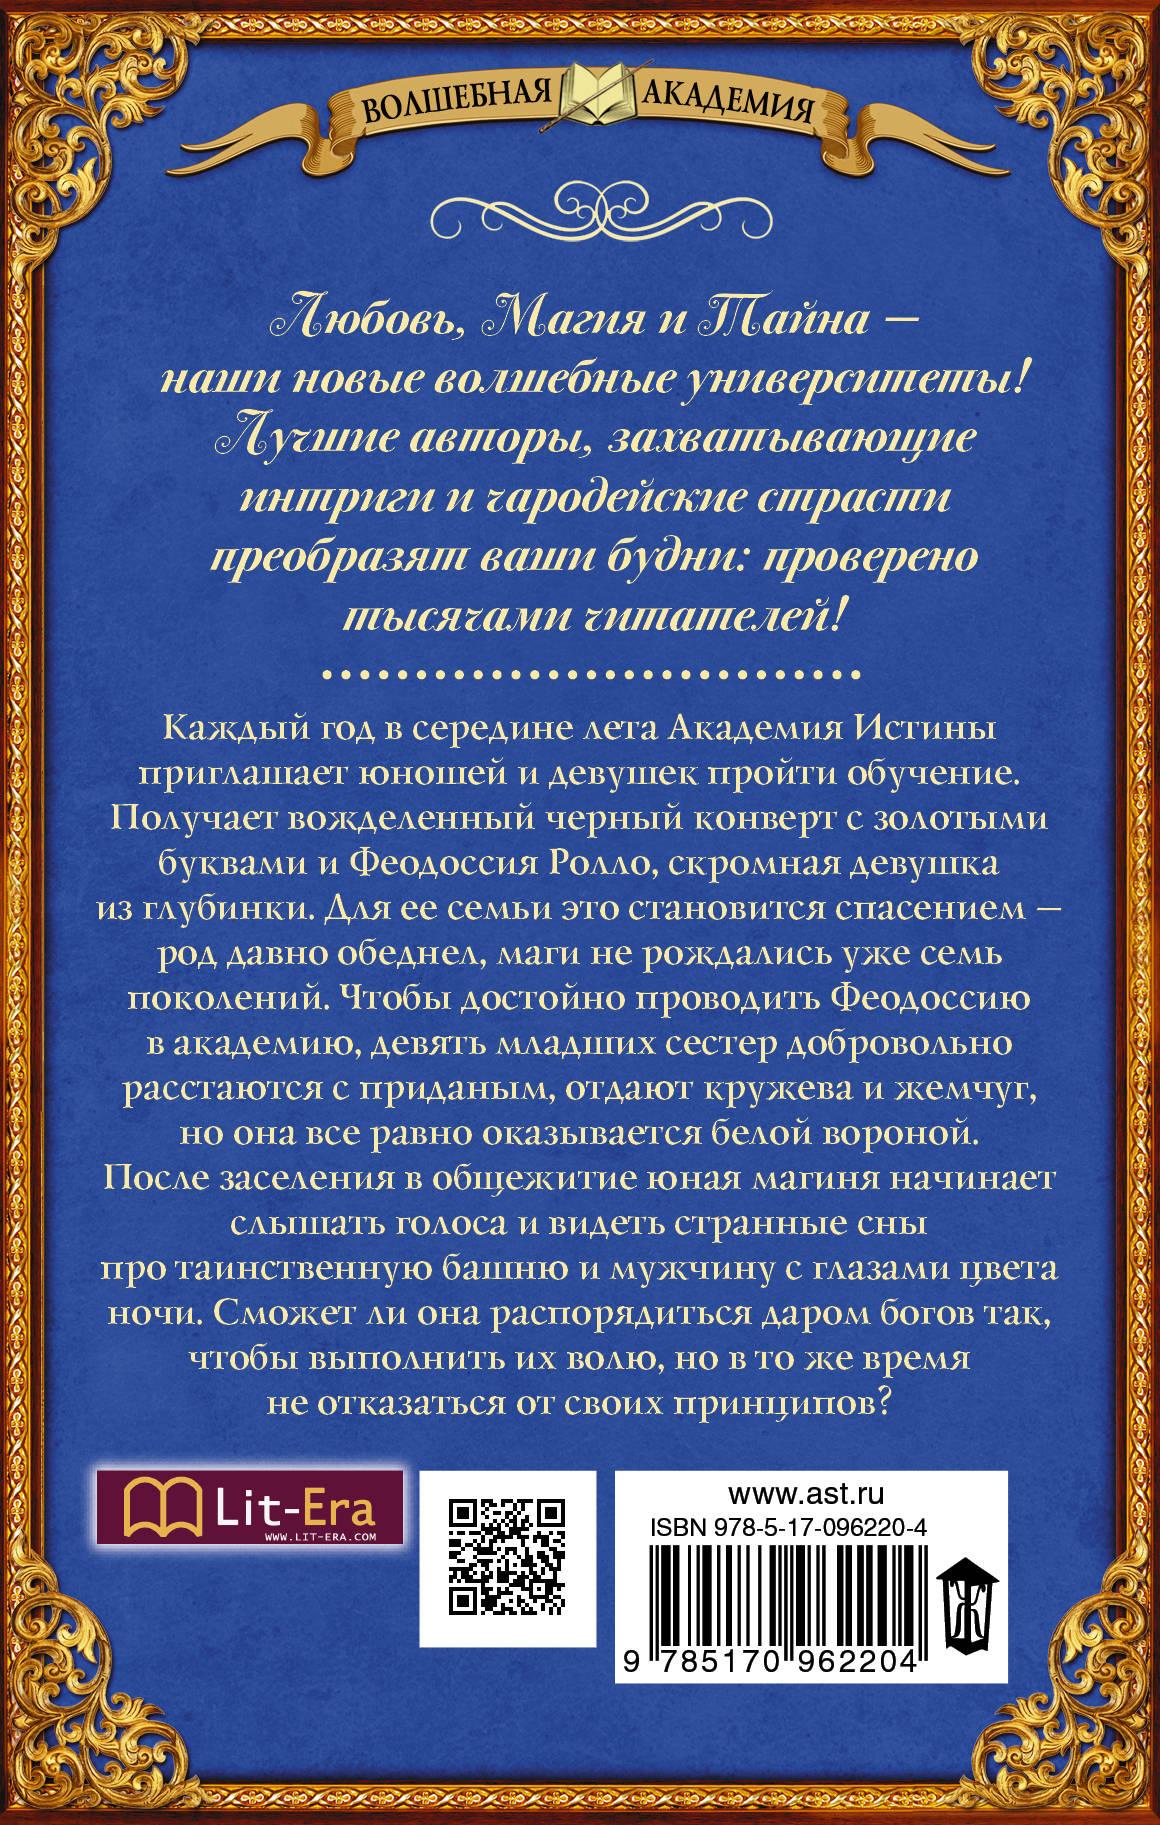 Академия Истины. Виктория Карелова